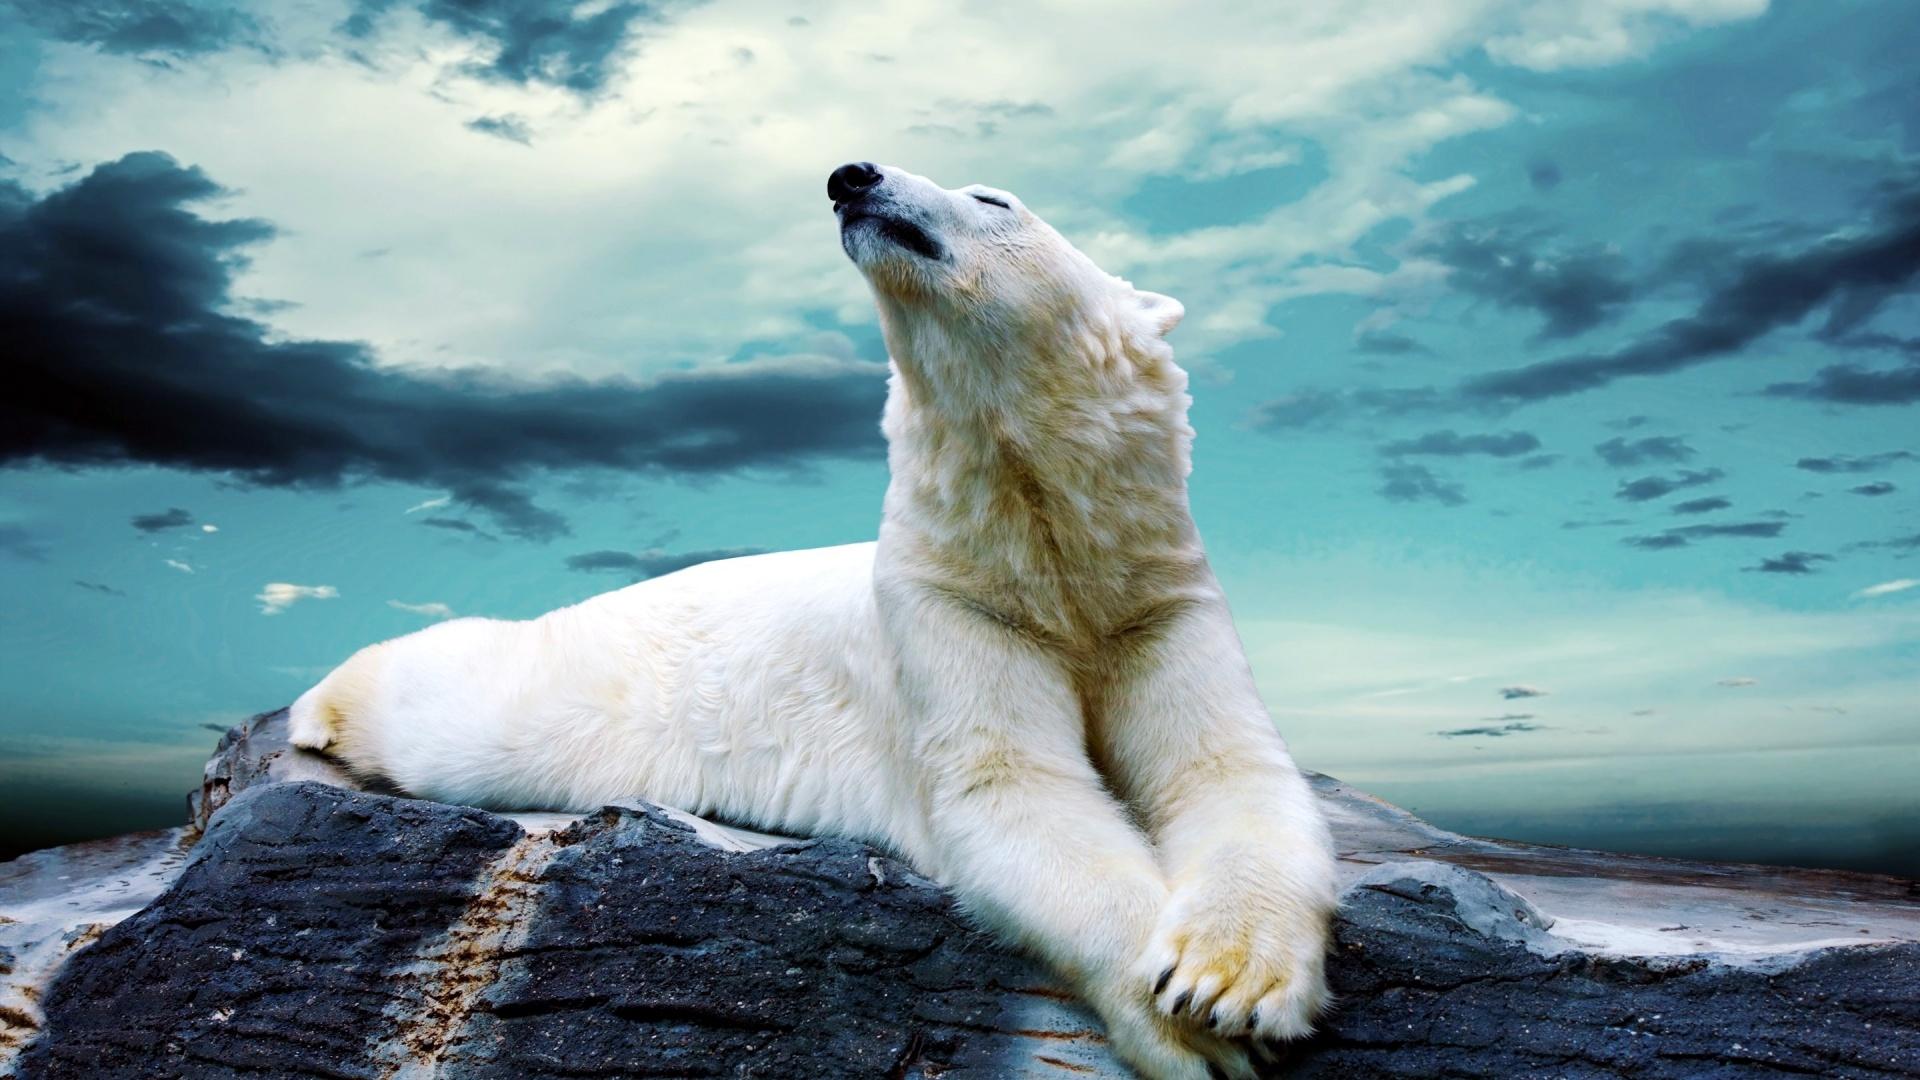 relaxing animal wallpaper 25142